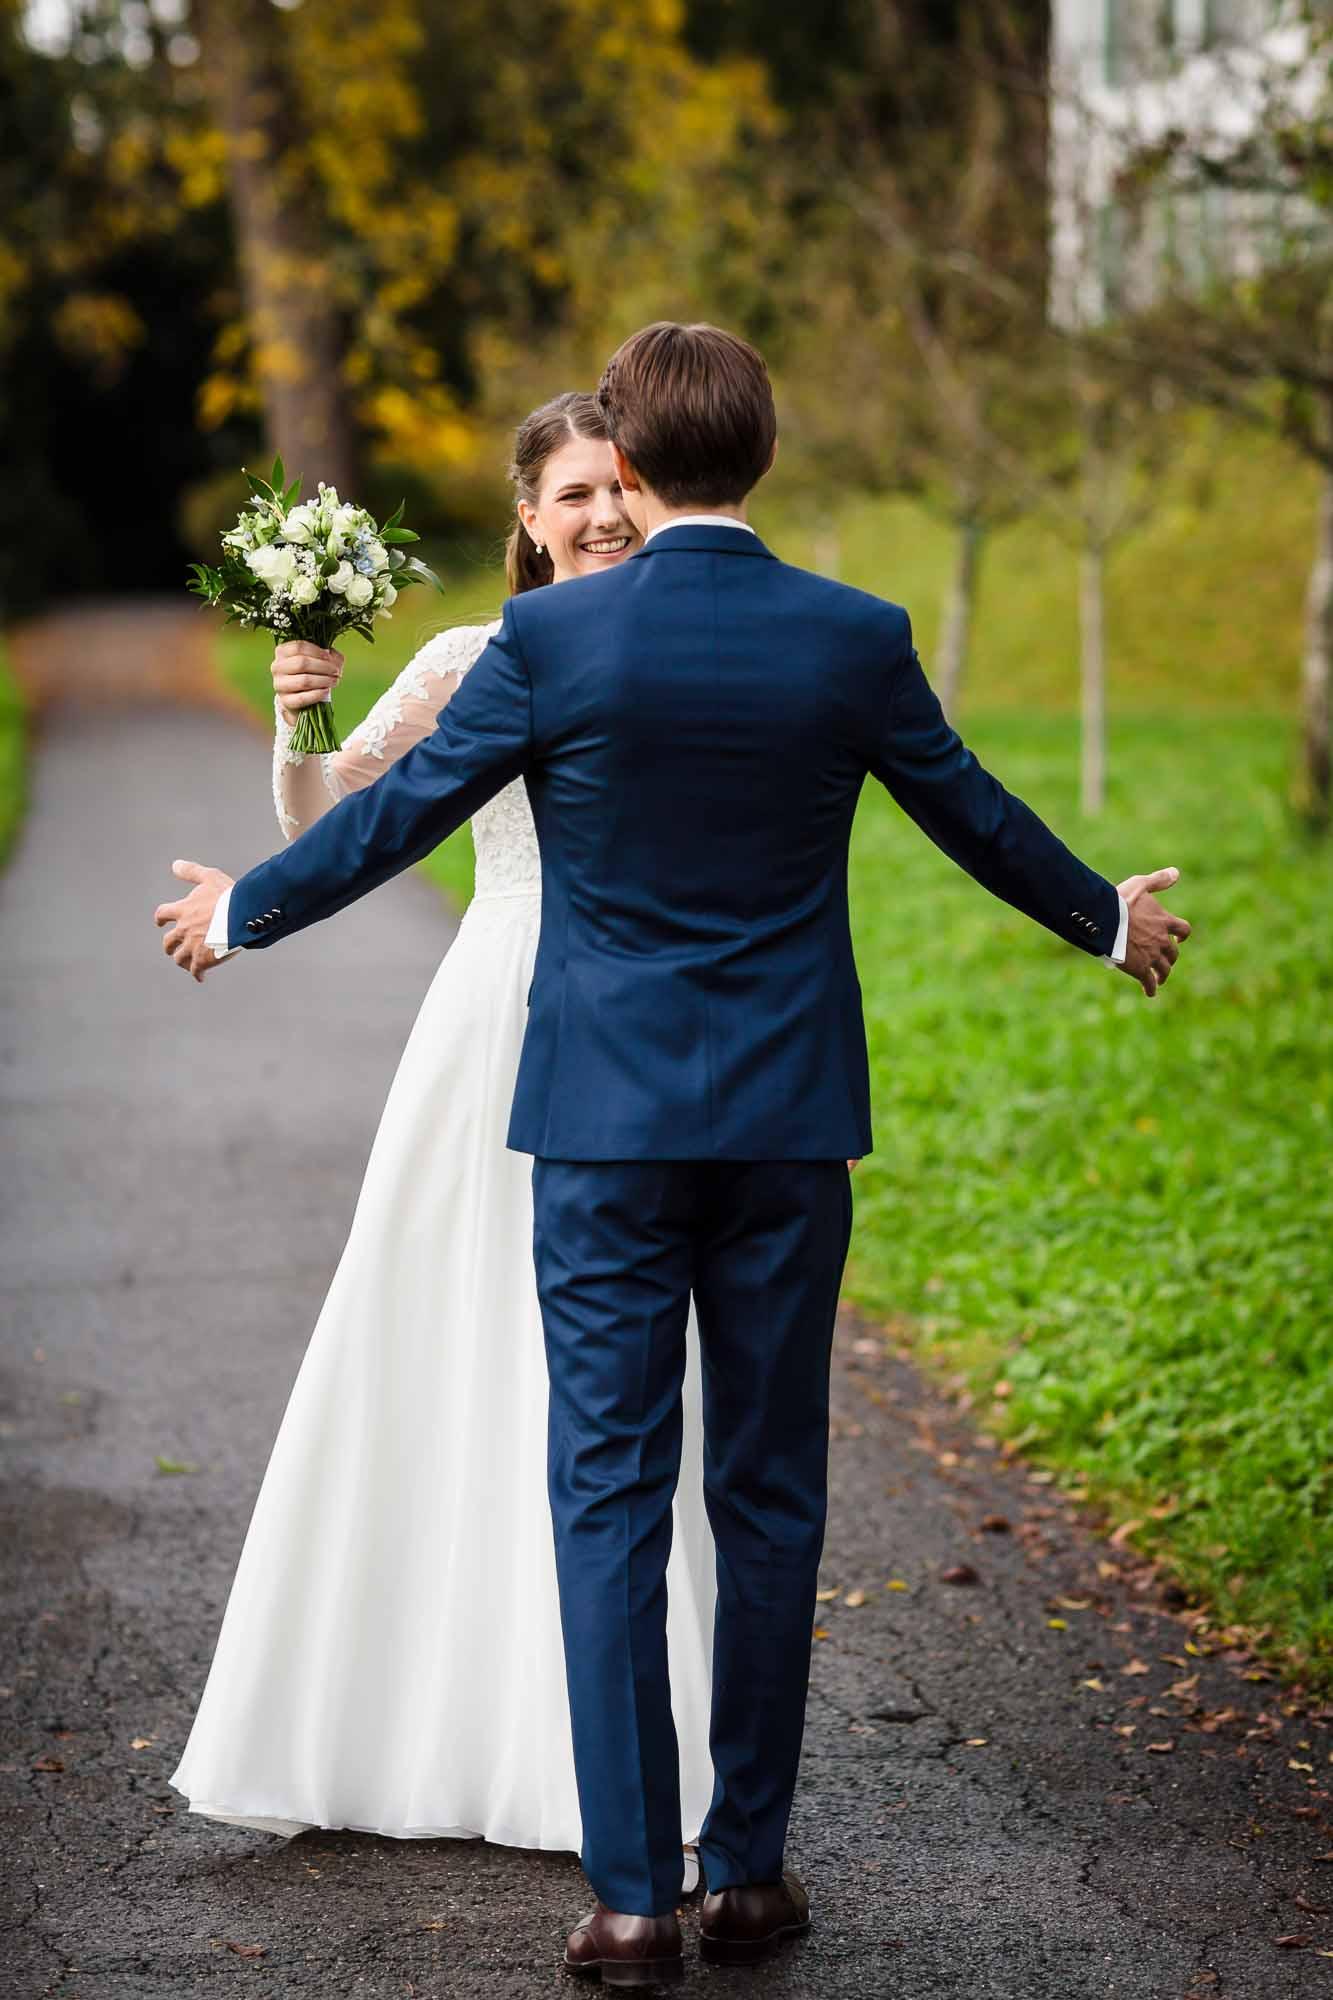 Bräutigam empfängt Braut